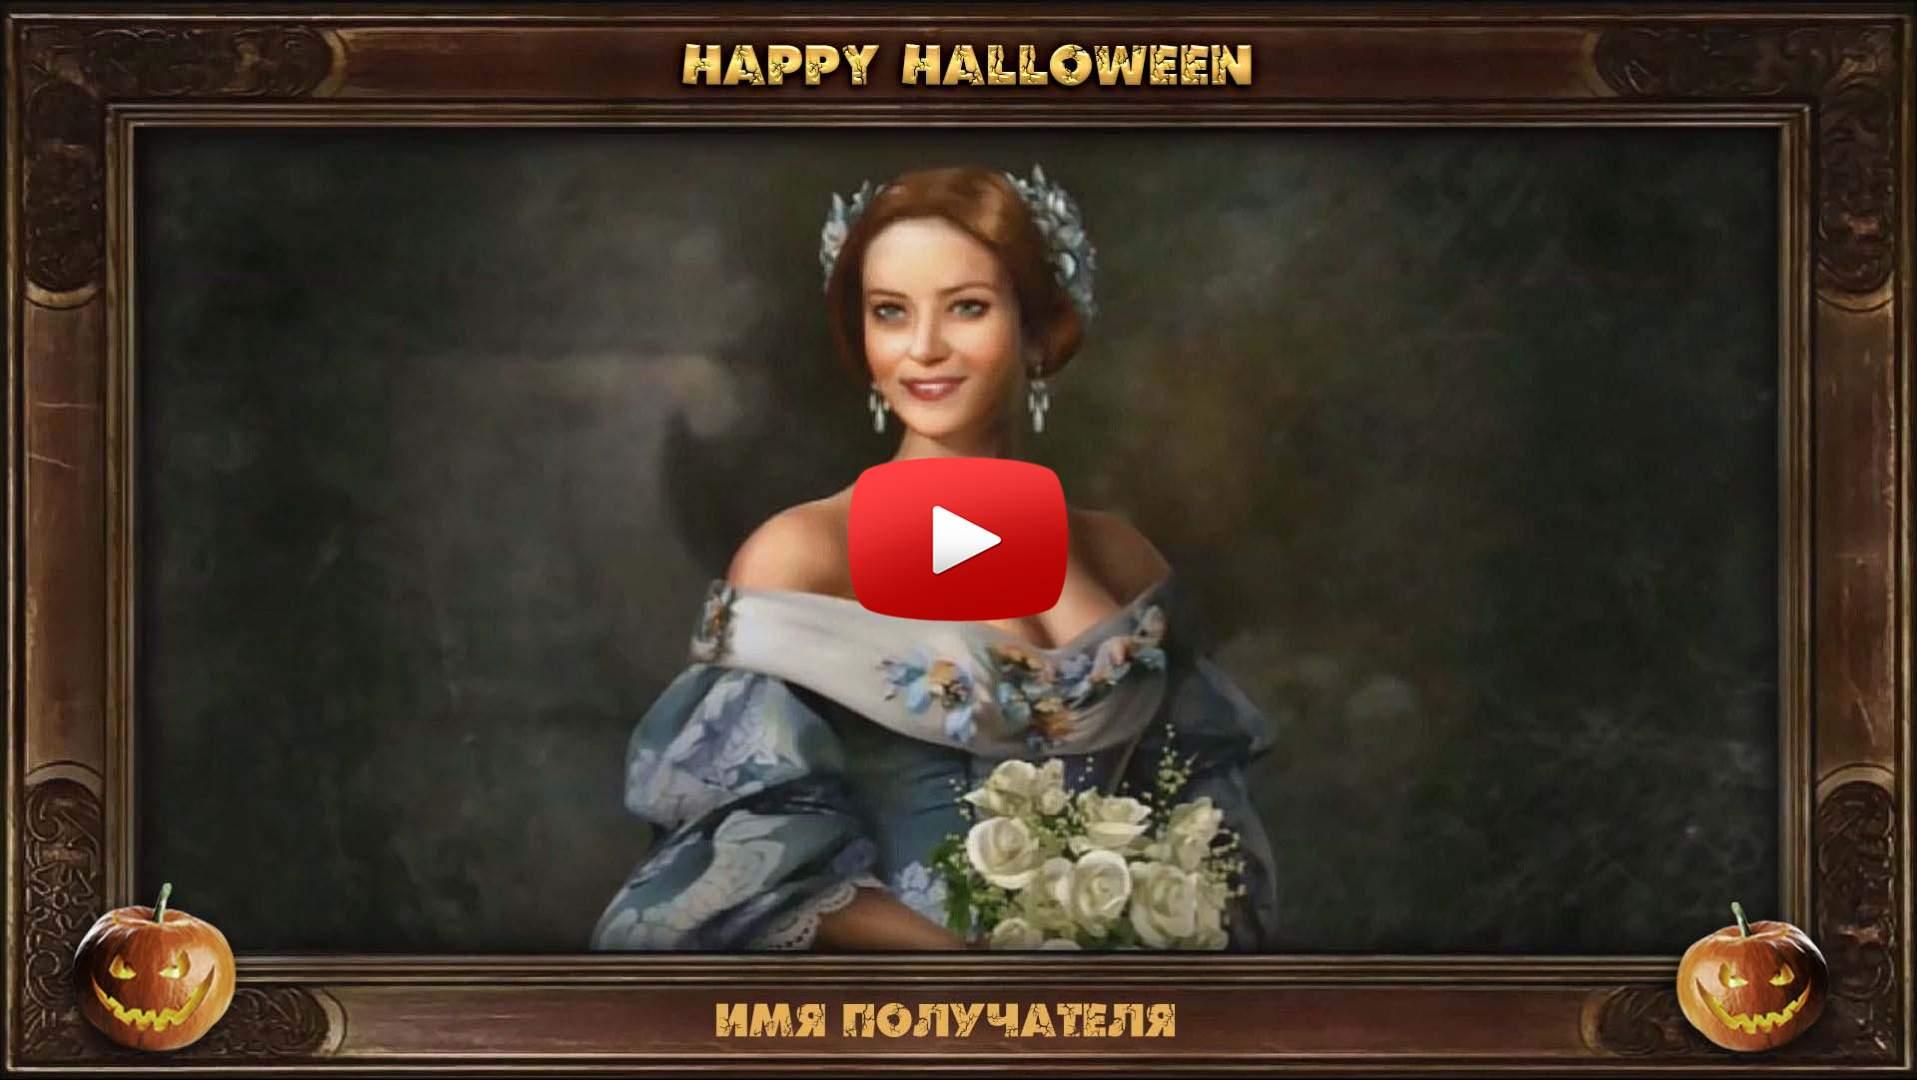 Хэллоуин - Добрая женщина!